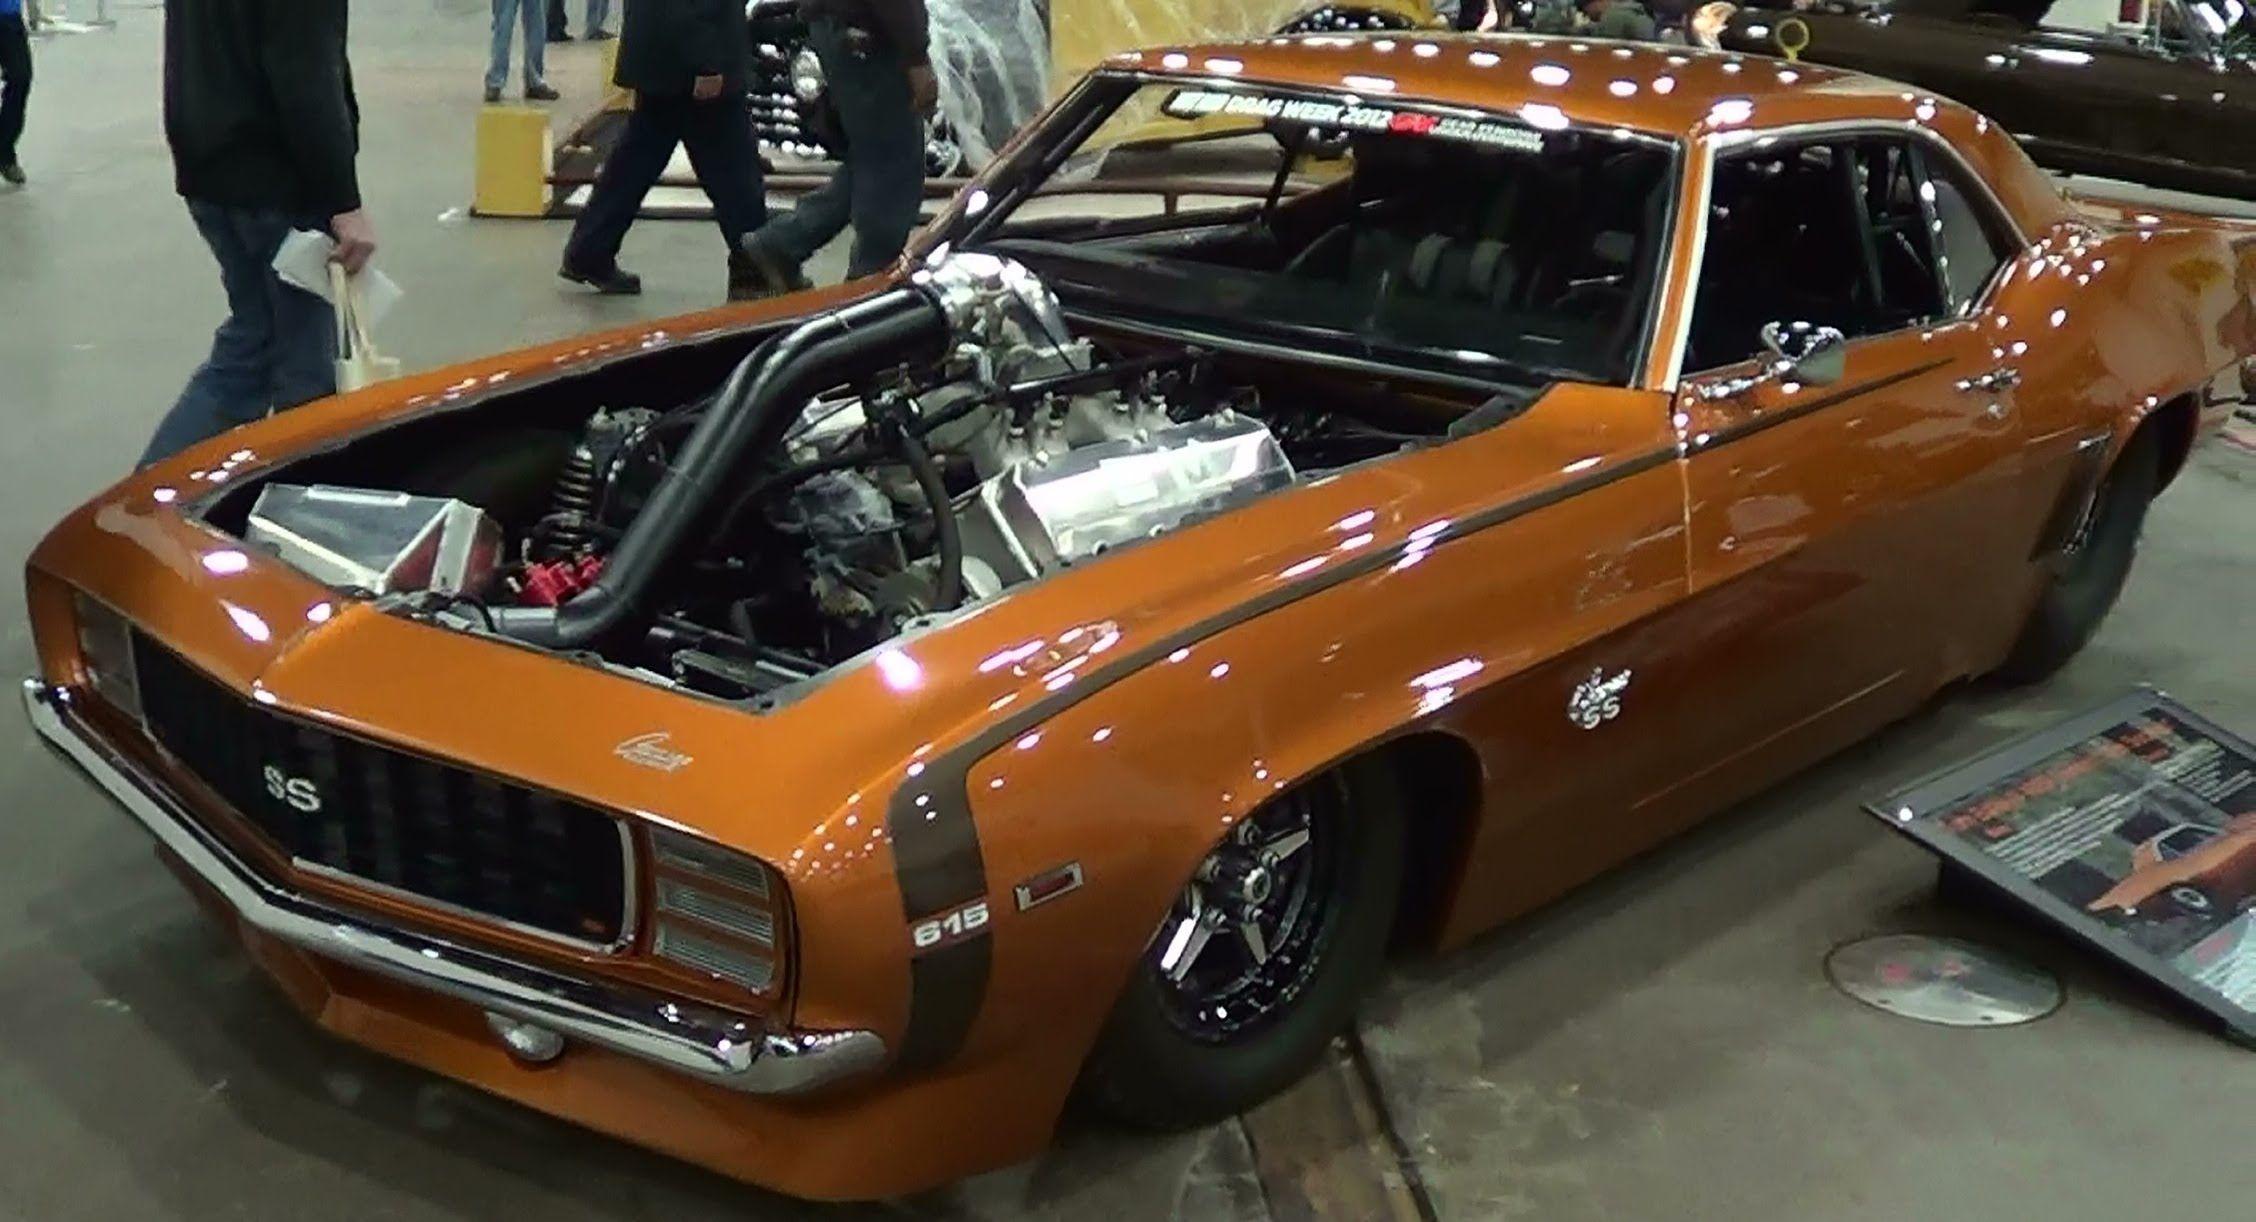 "1969 Twin Turbo Camaro ""Sick Seconds"" 3350 Horse Power Street Car"